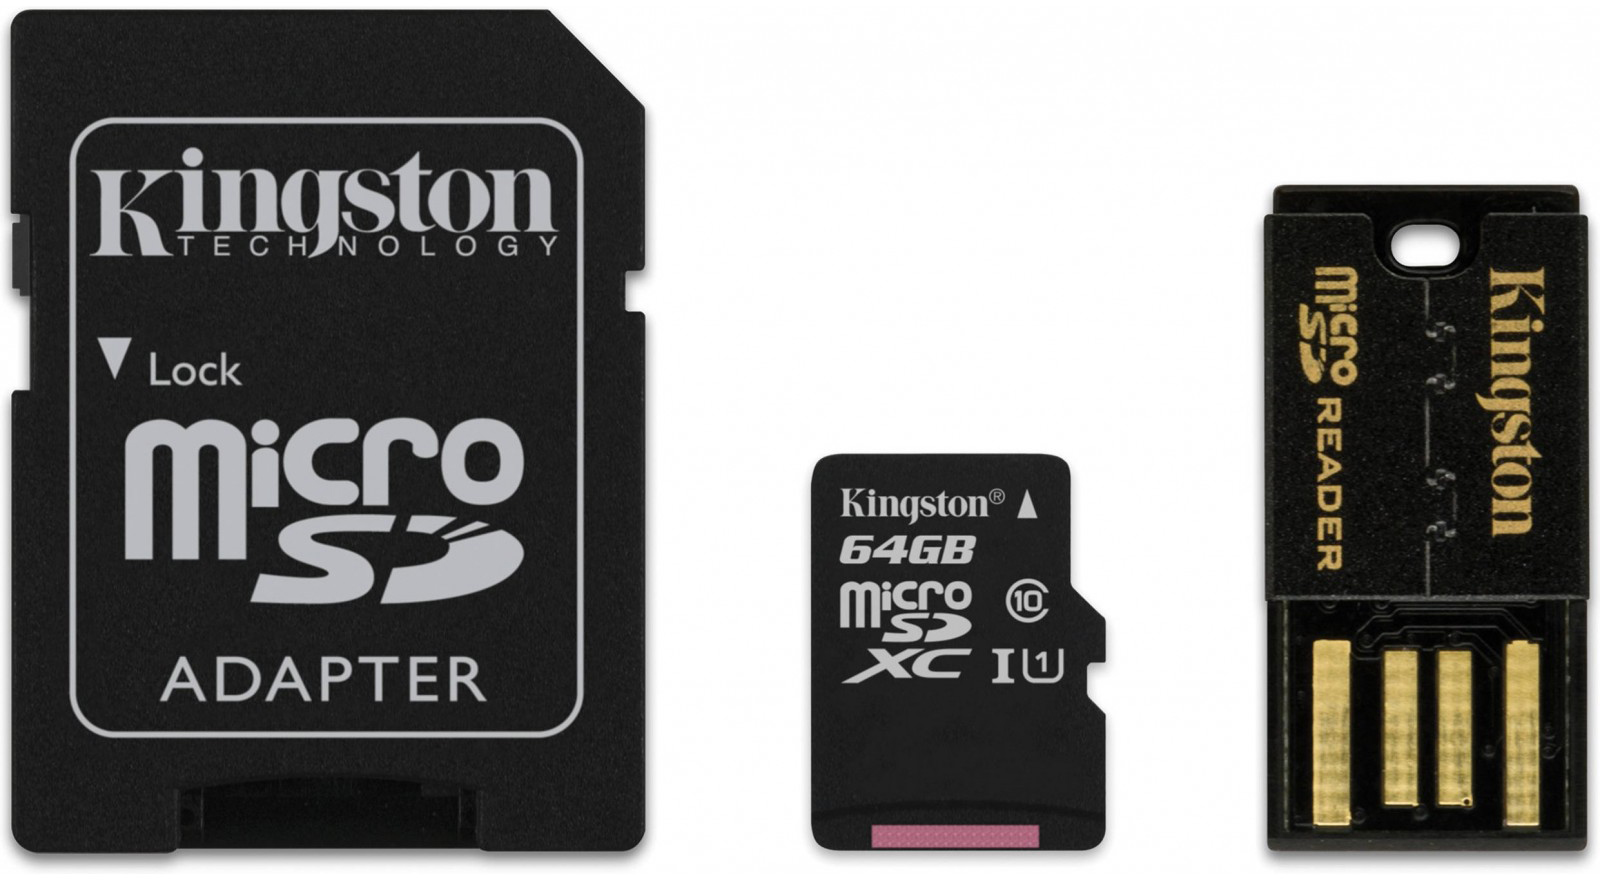 Kingston microSDXC 64Gb Class 10 U1 UHS-I (MBLY10G2/64GB) - карта памяти с адаптером и USB-картридером